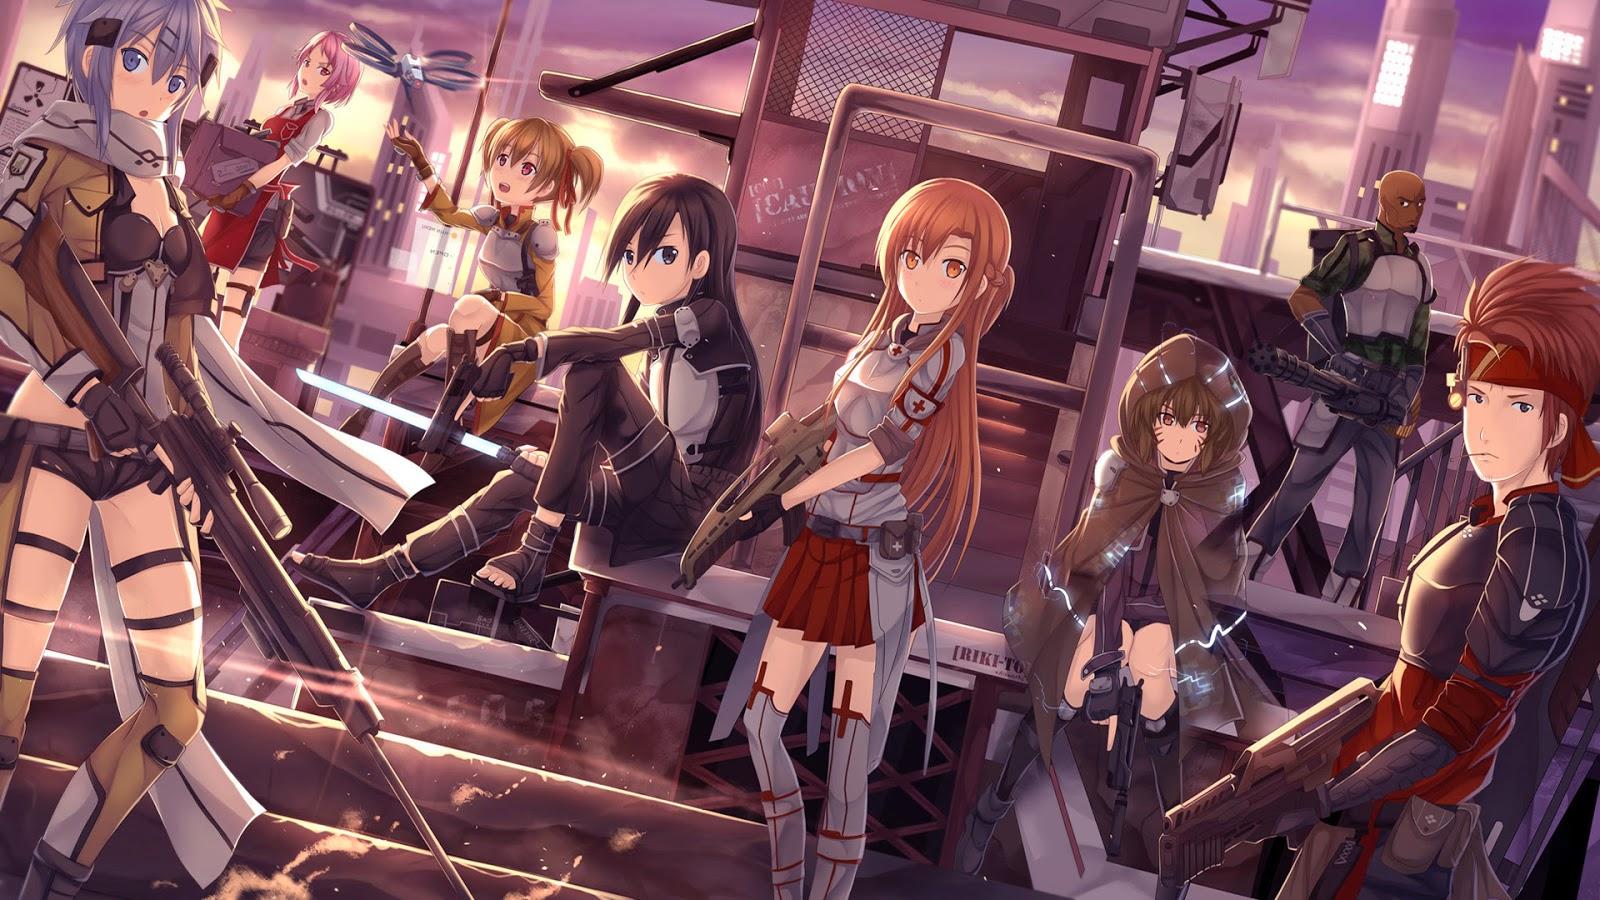 Asuna Sword Art Online 2 Gun Gale Anime 2014 Hd Wallpaper 1600x900